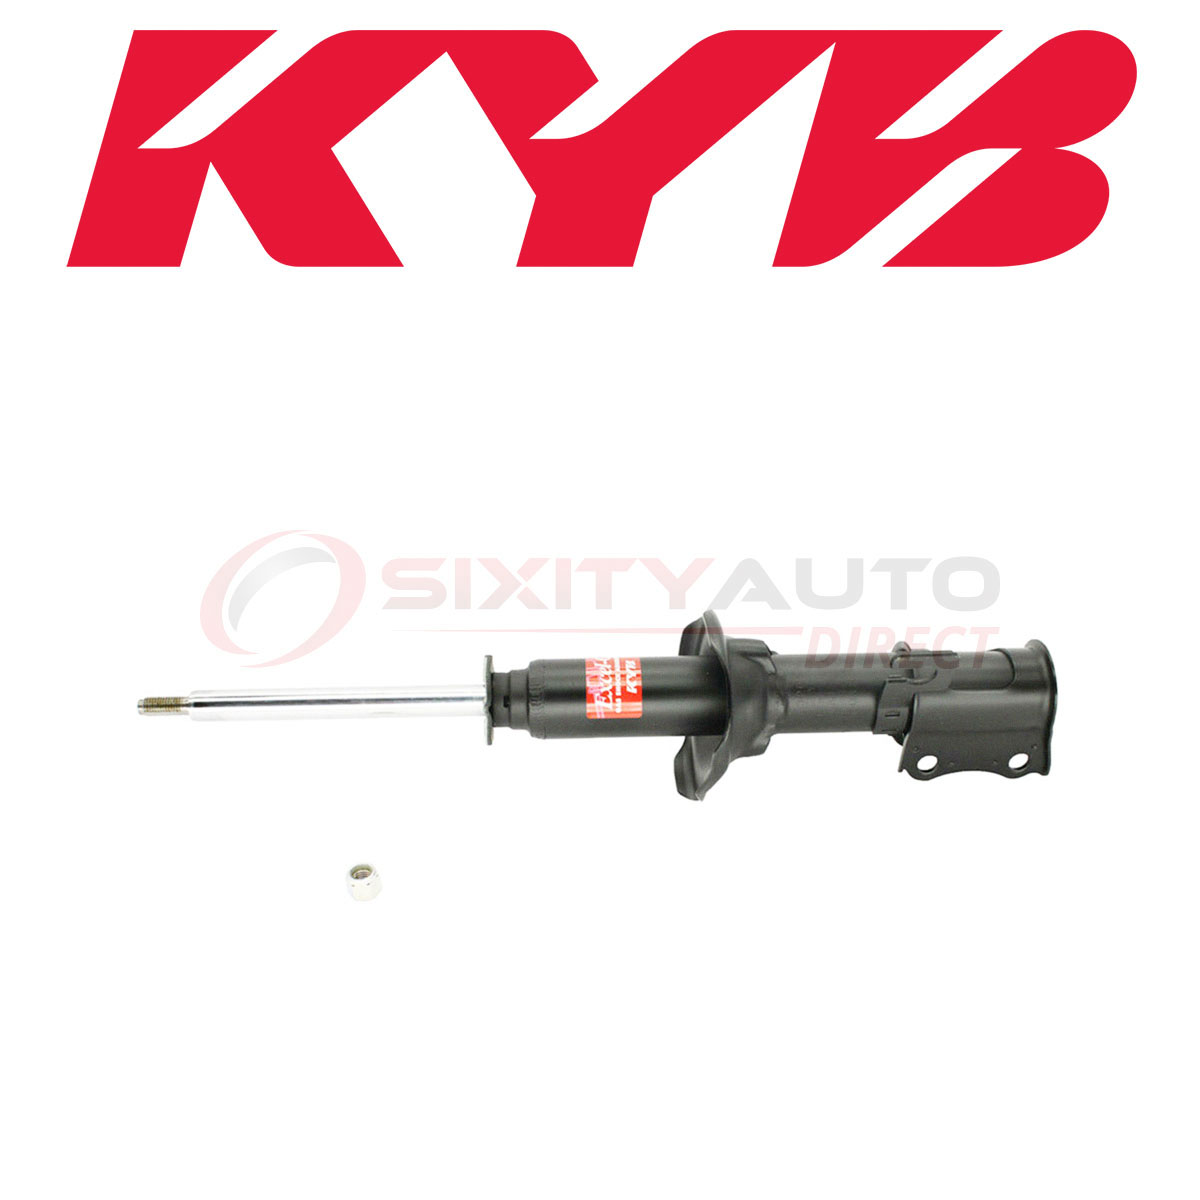 Fits Ford Festiva 1.3L l4 GAS Front Left Shock Absorber KYB Excel-G 232022